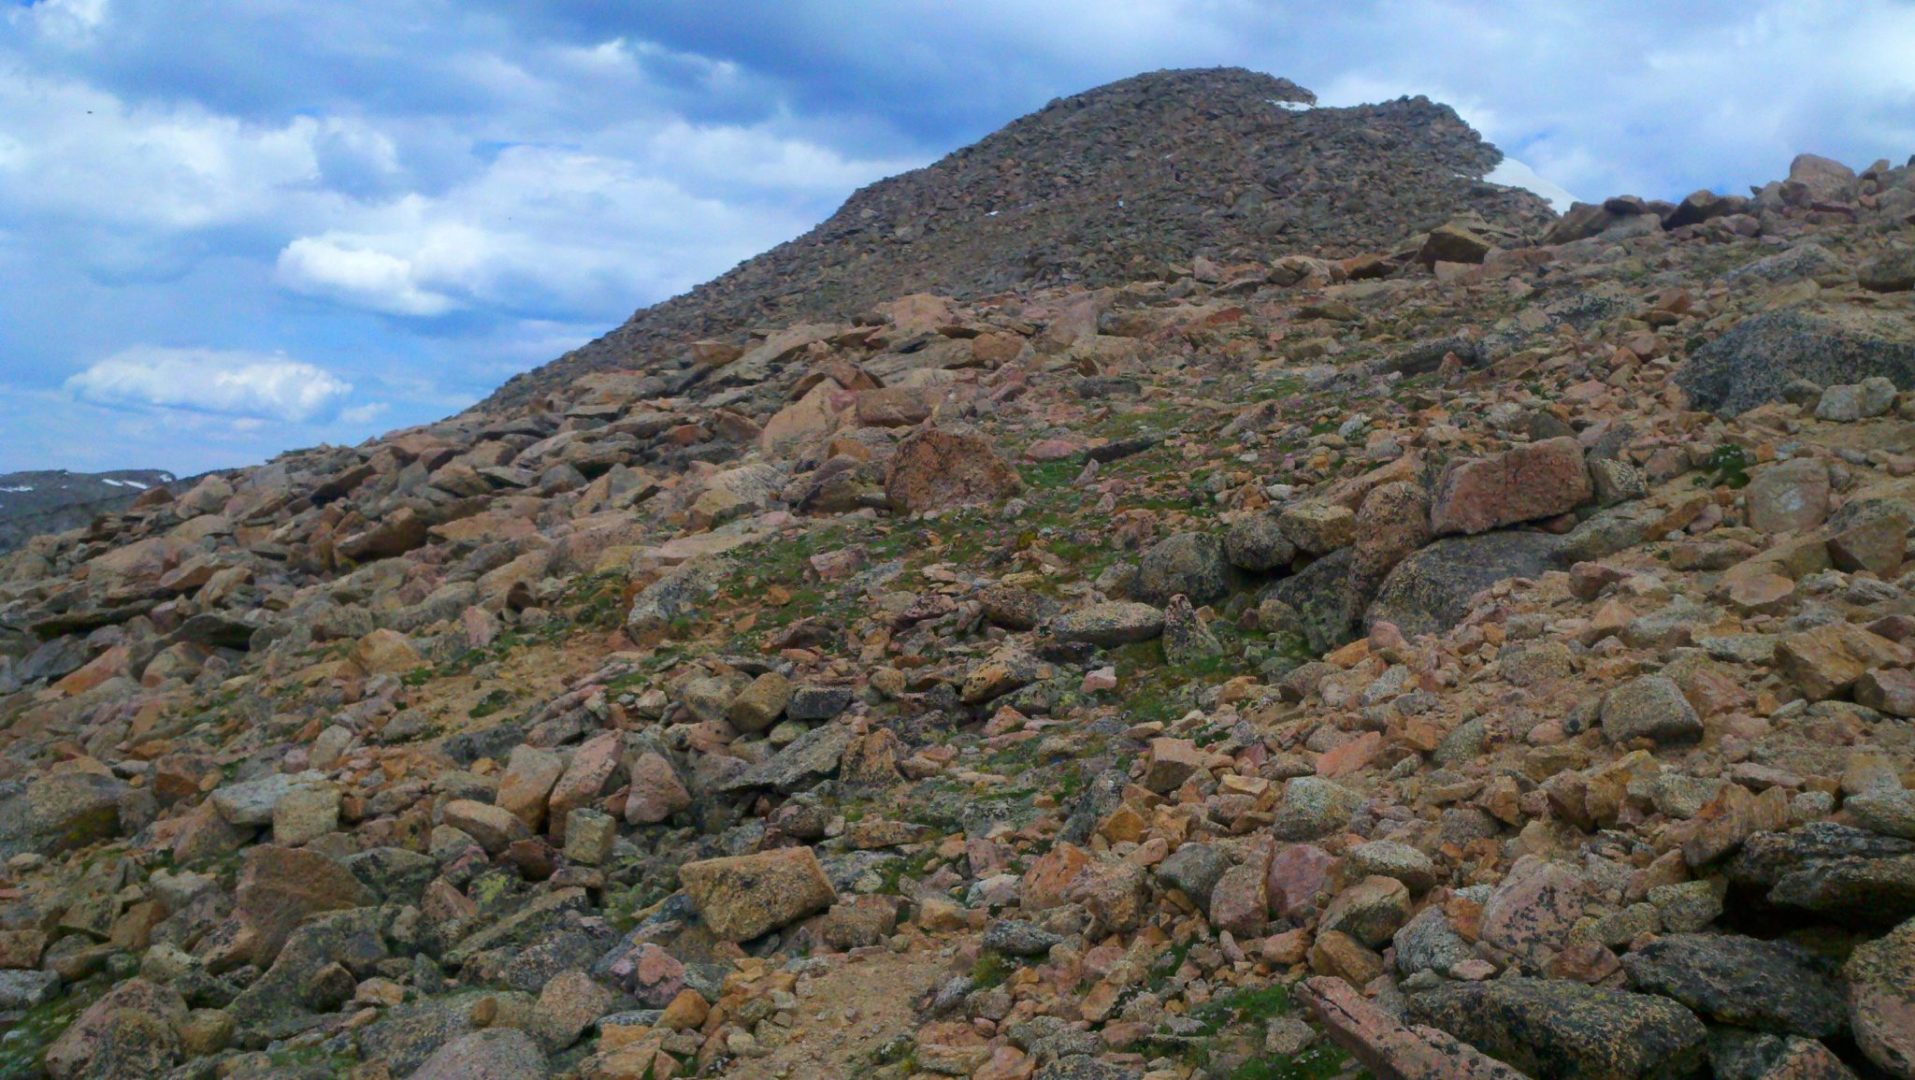 Mt Bierstadt summit ahead